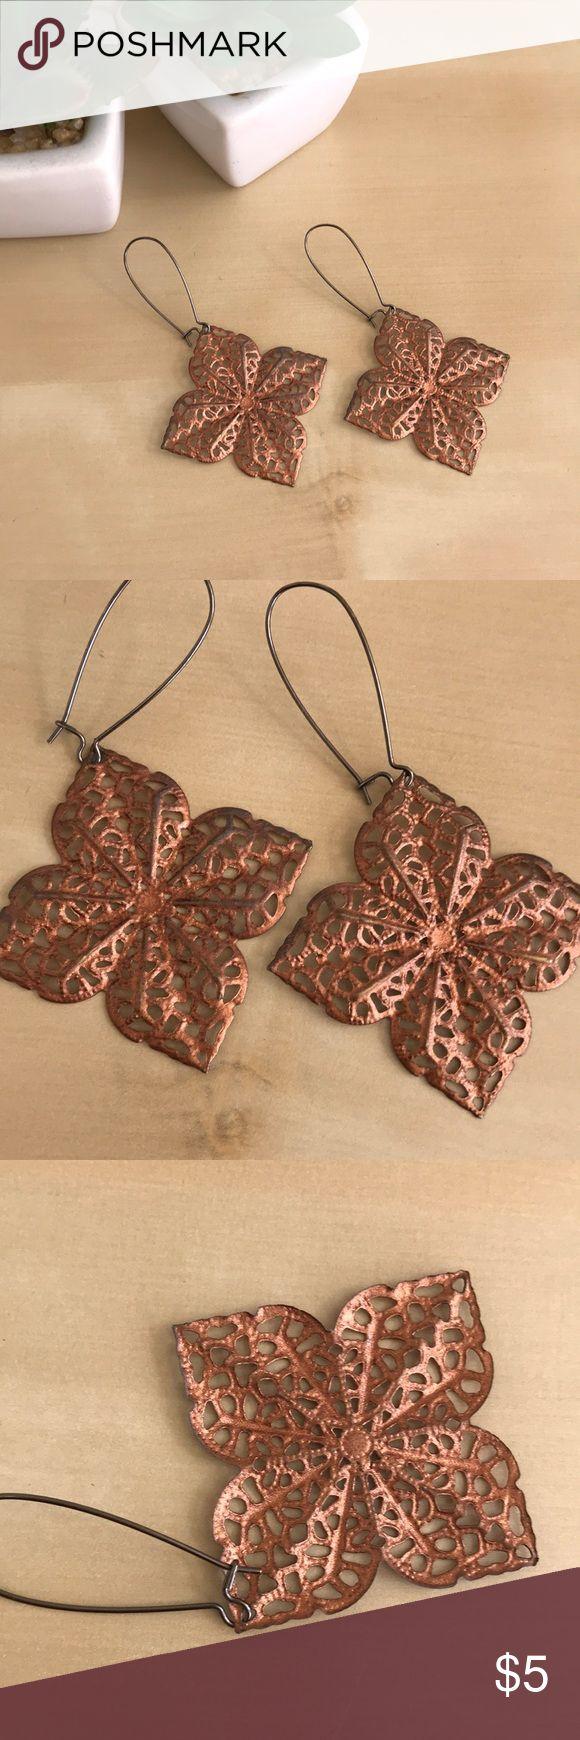 Copper Flower Earrings Gorgeous cut out Copper flower pattern earrings. Lightweight and not heavy at all. Jewelry Earrings